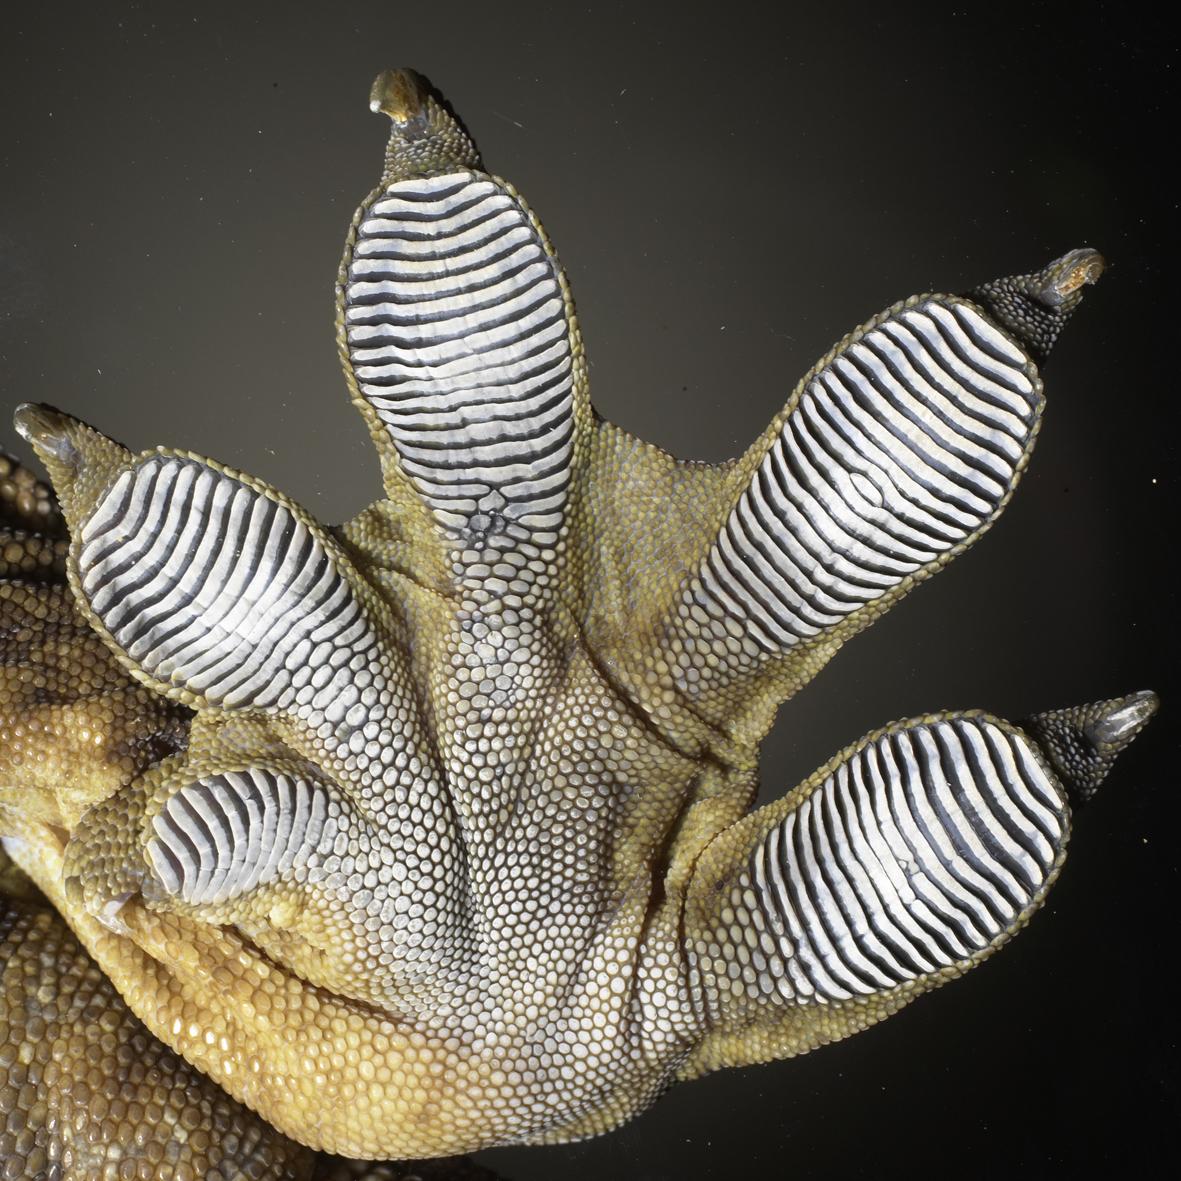 Scientific Image Gecko Foot Nise Network